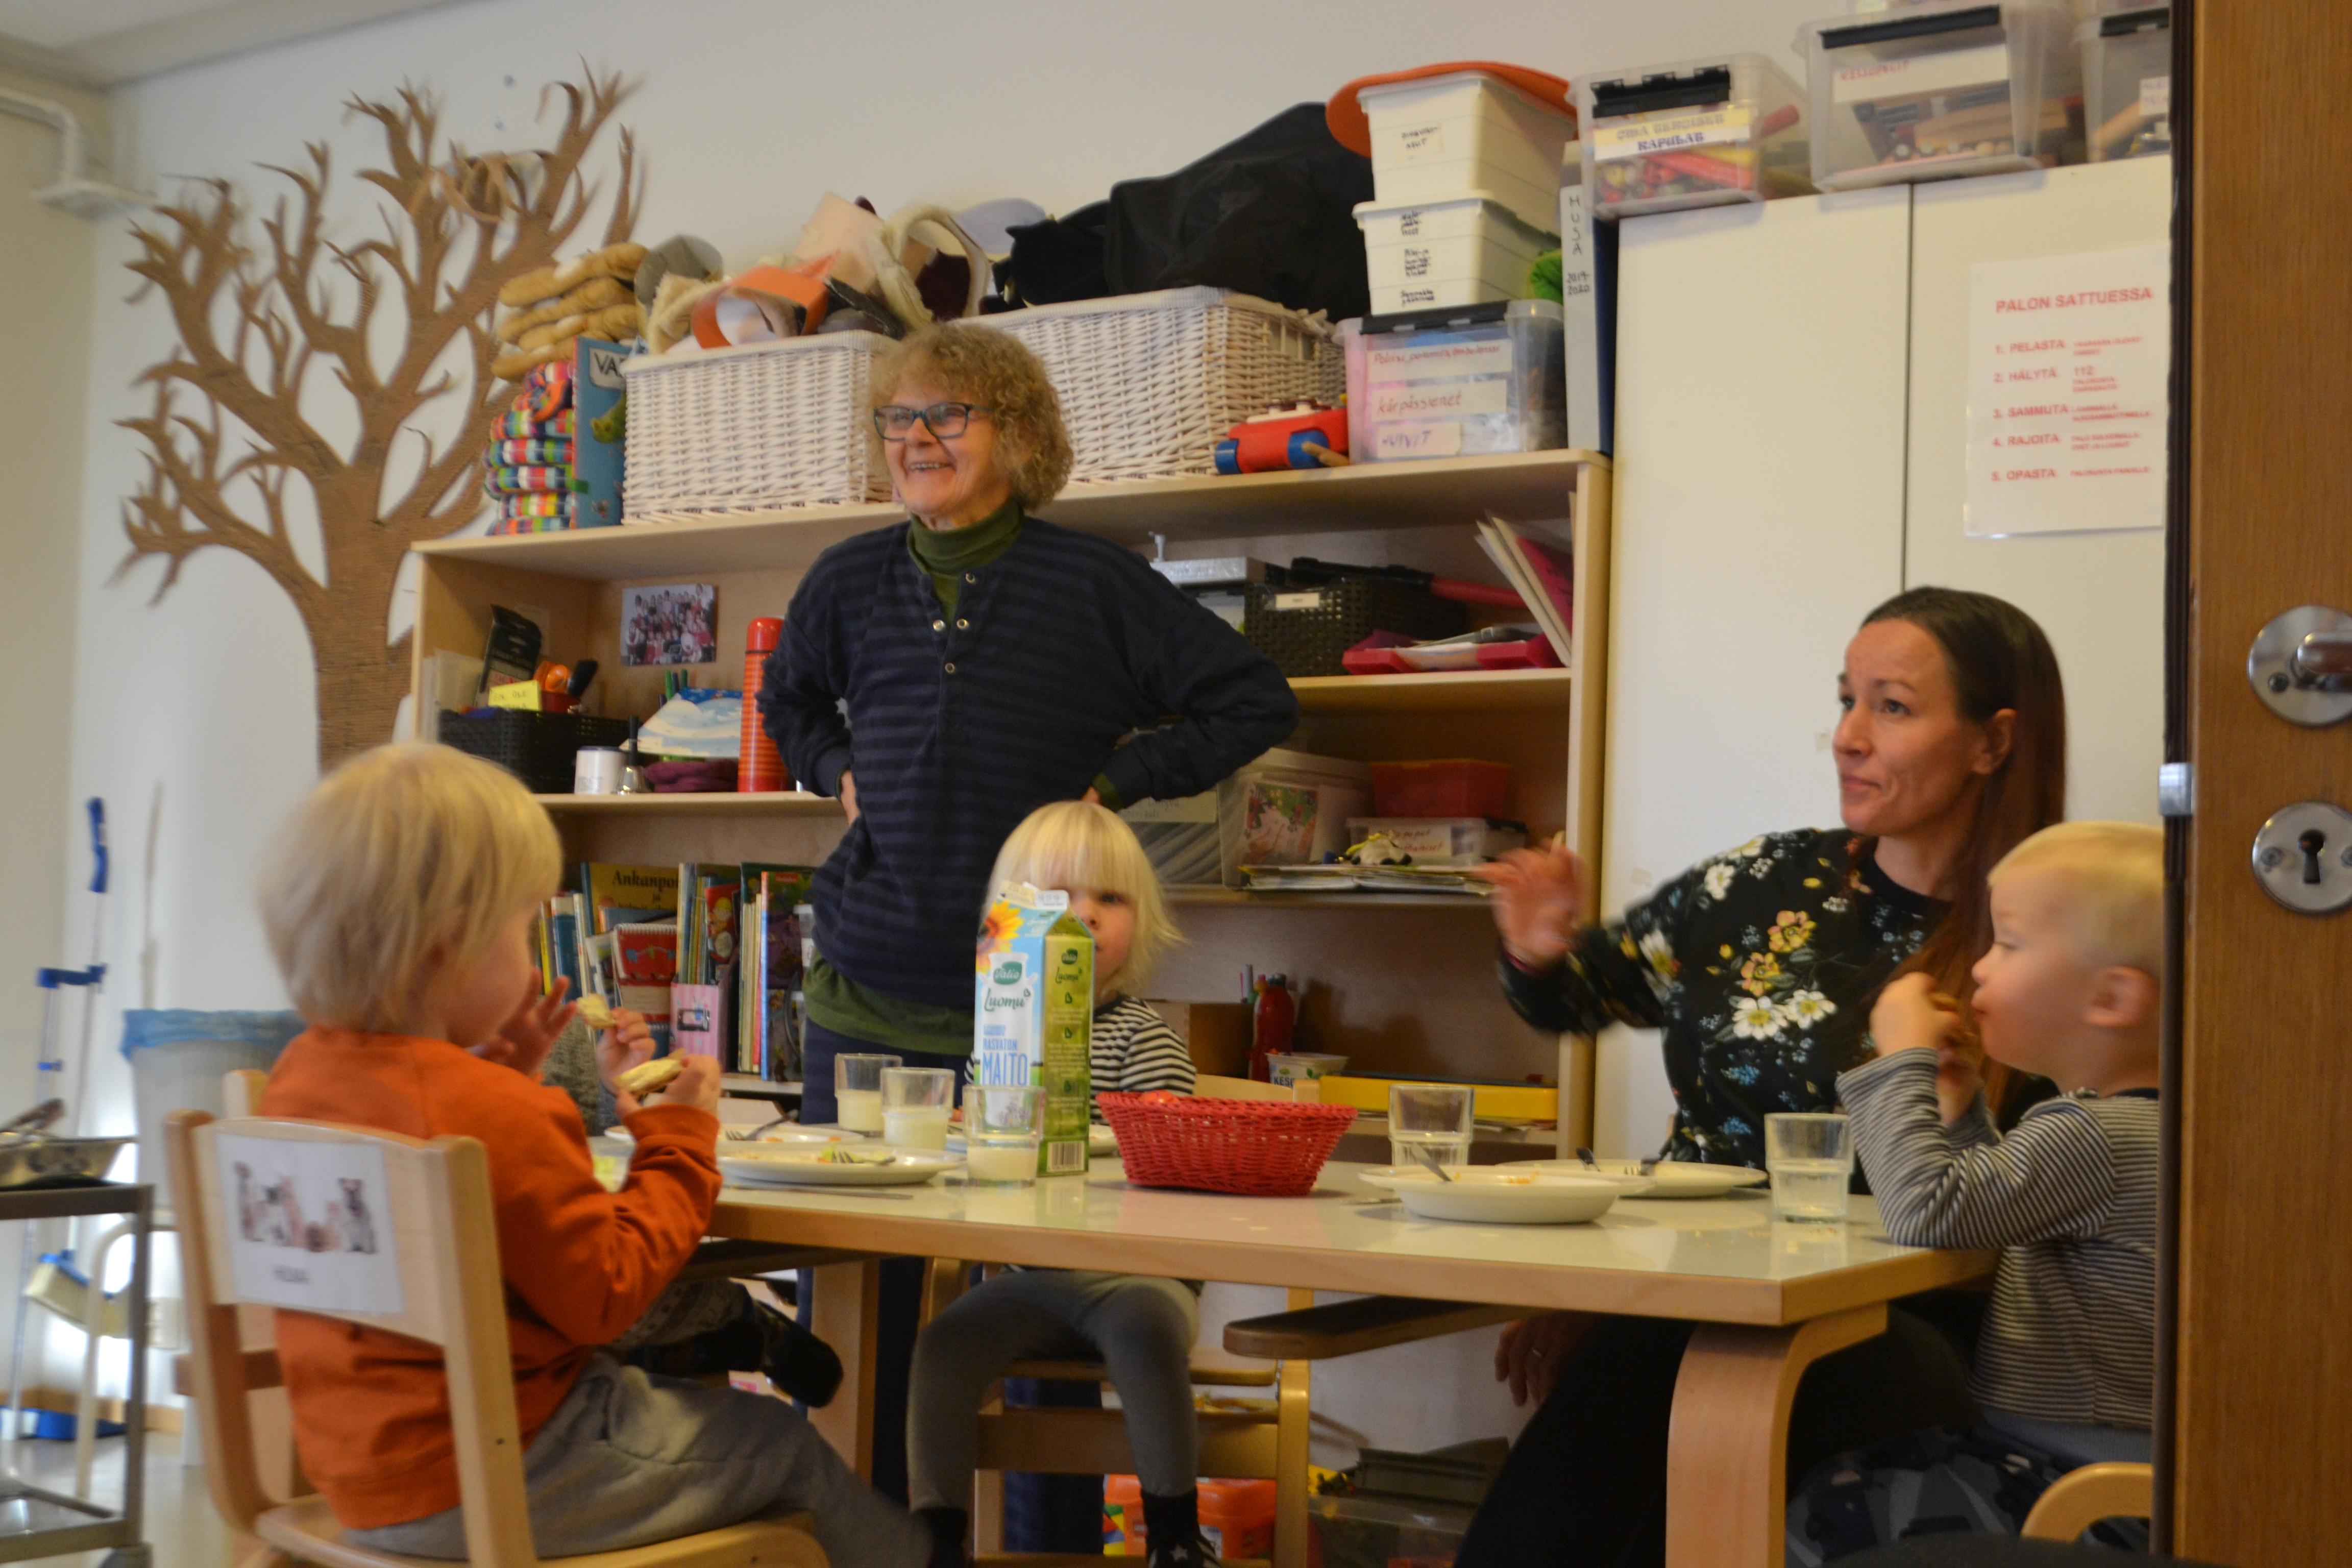 Marjatta Ahonen serves lunch with Maileena Nieminen